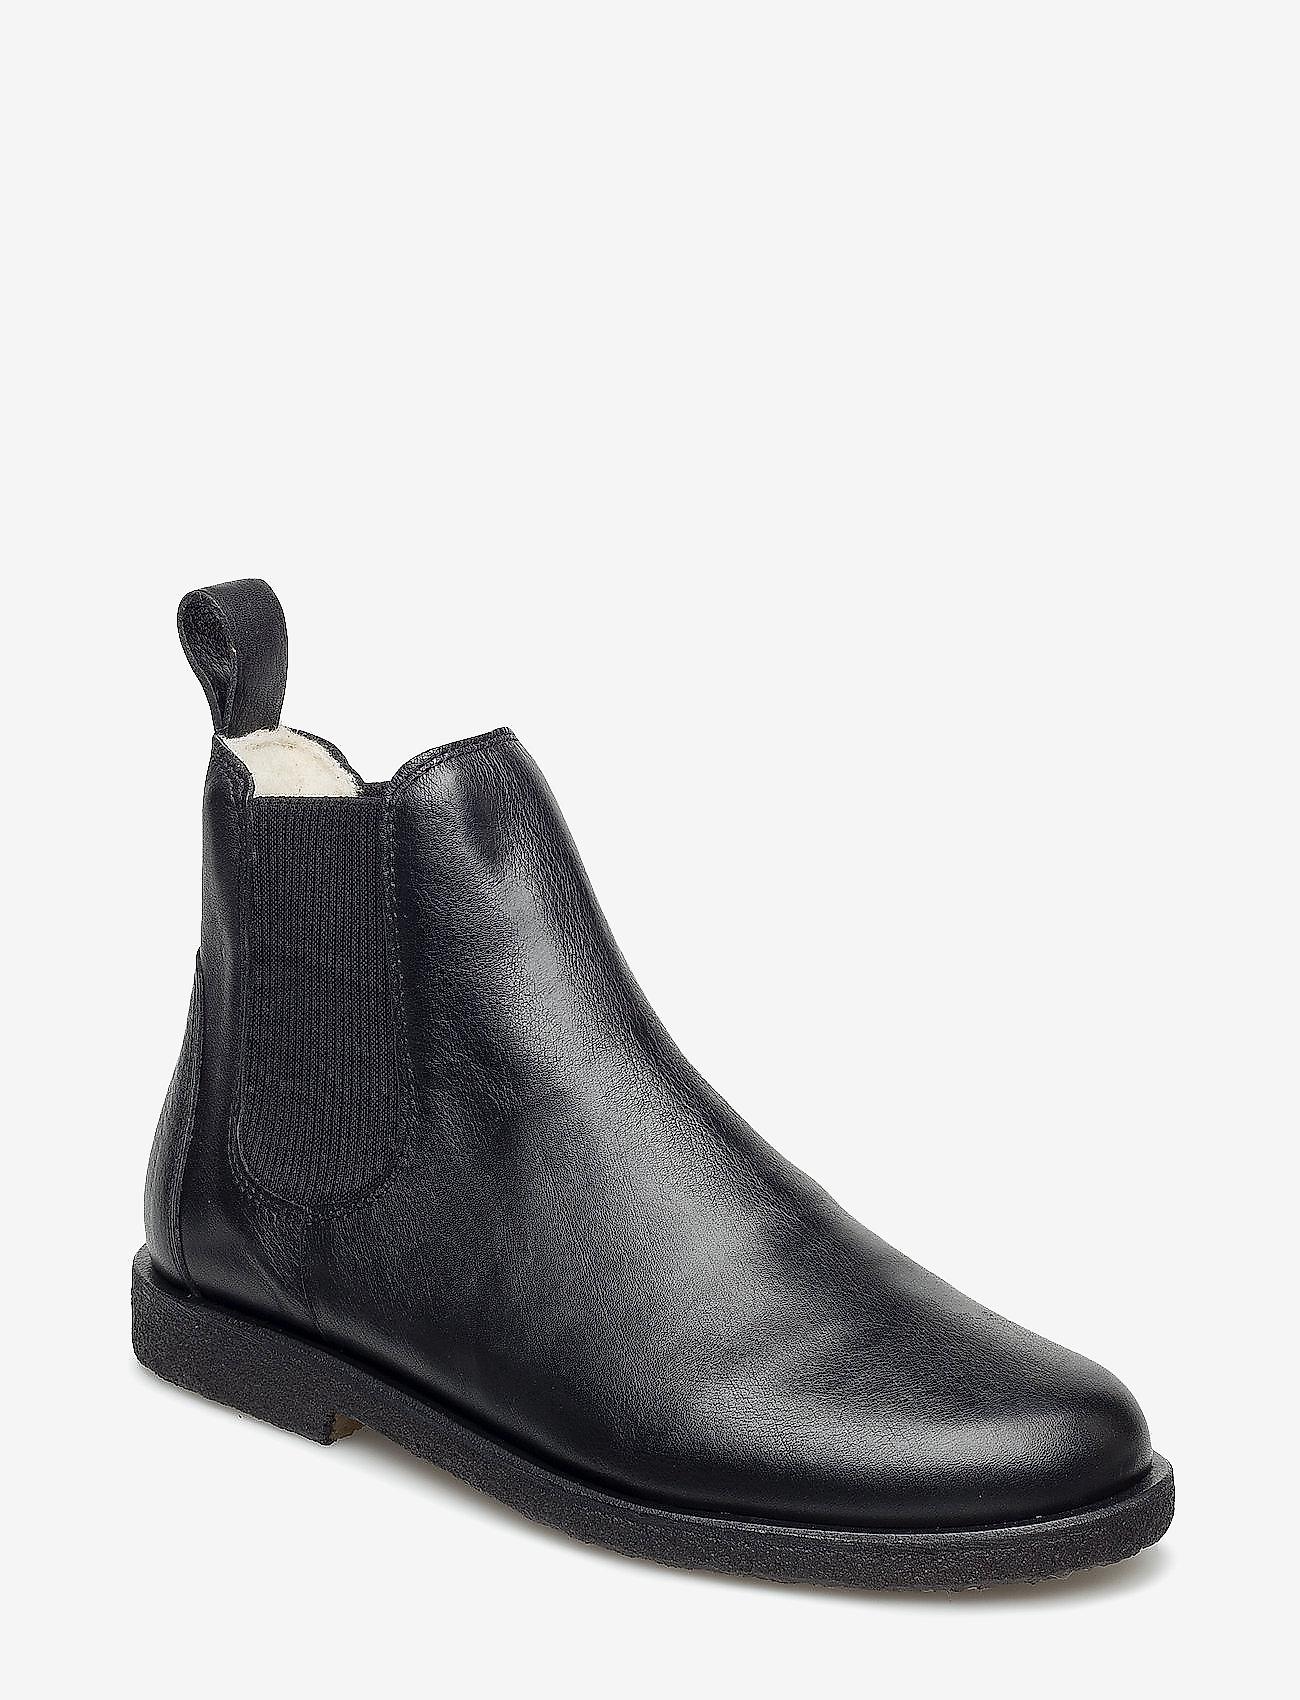 ANGULUS - Chelsea boot - lage hakken - 1933/019 black/black